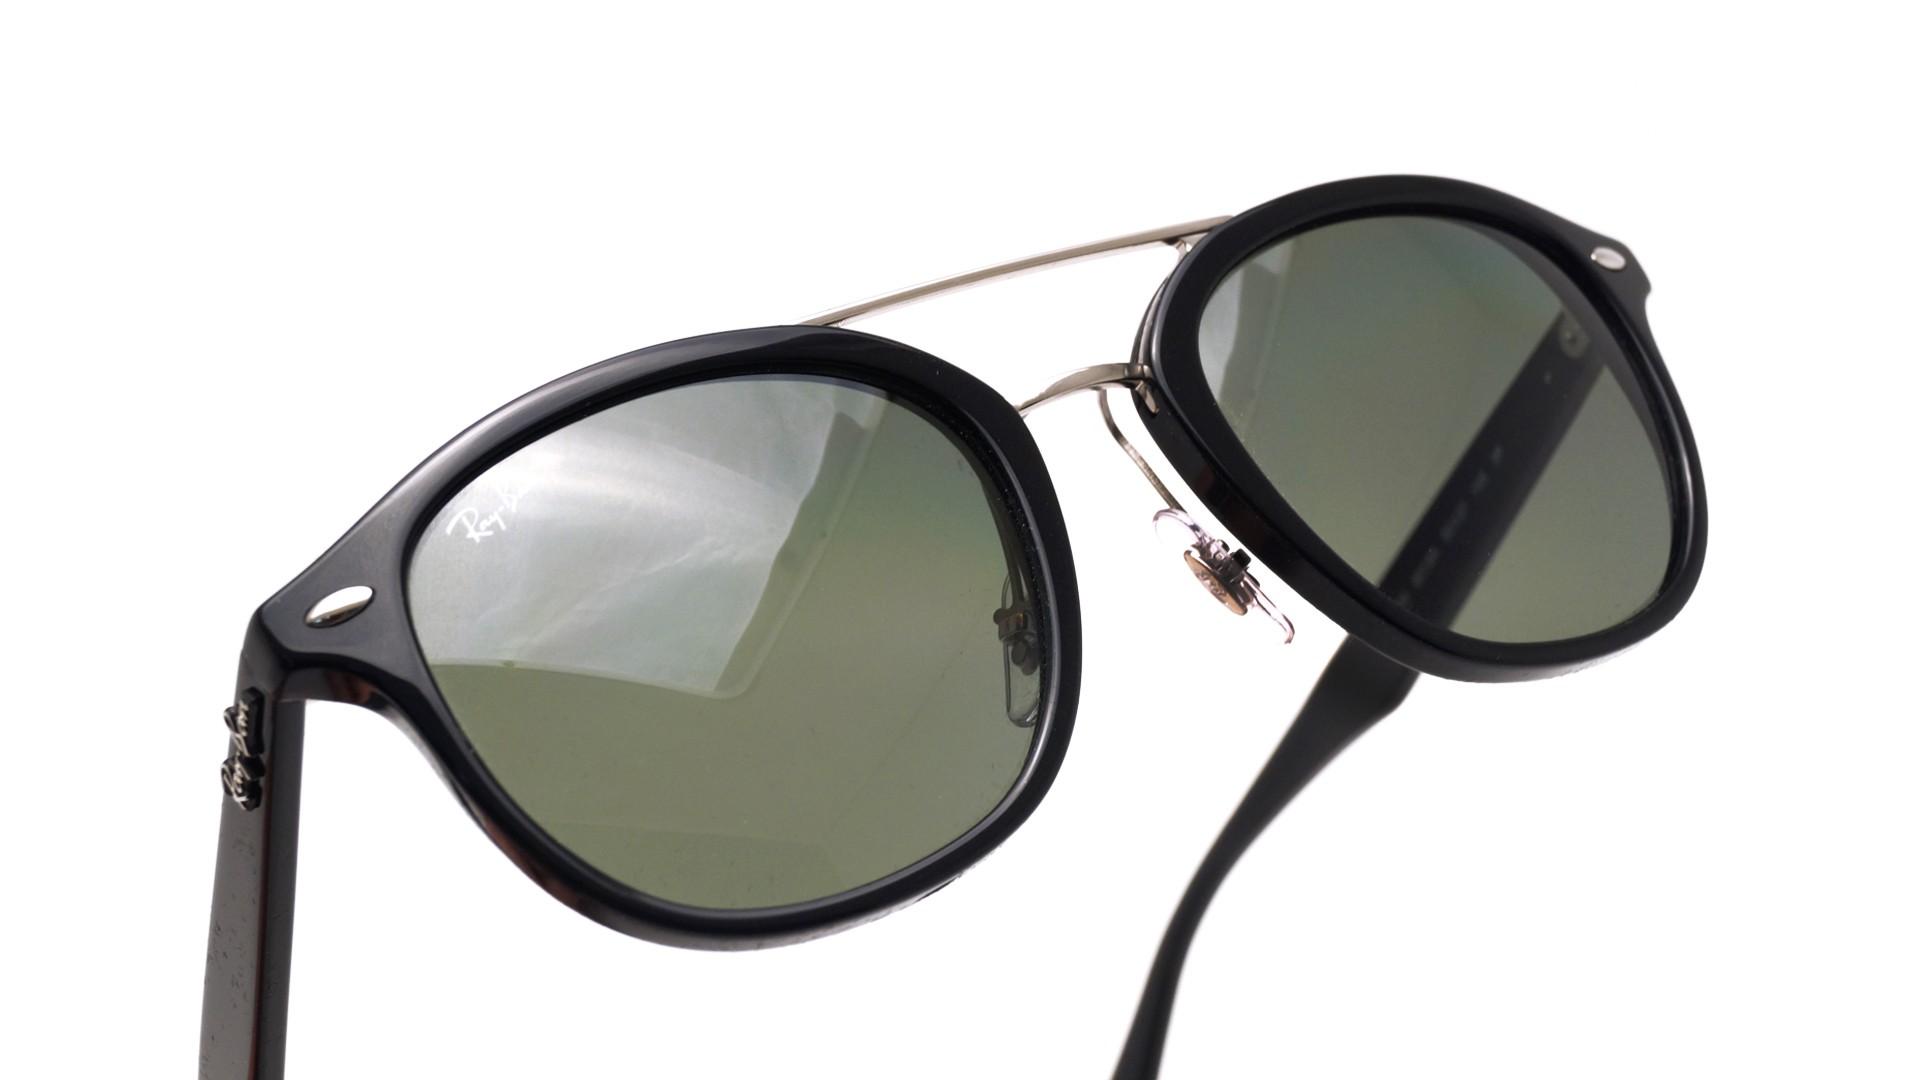 d4127296d3 Sunglasses Ray-Ban Highstreet Black RB2183 901 71 53-21 Medium